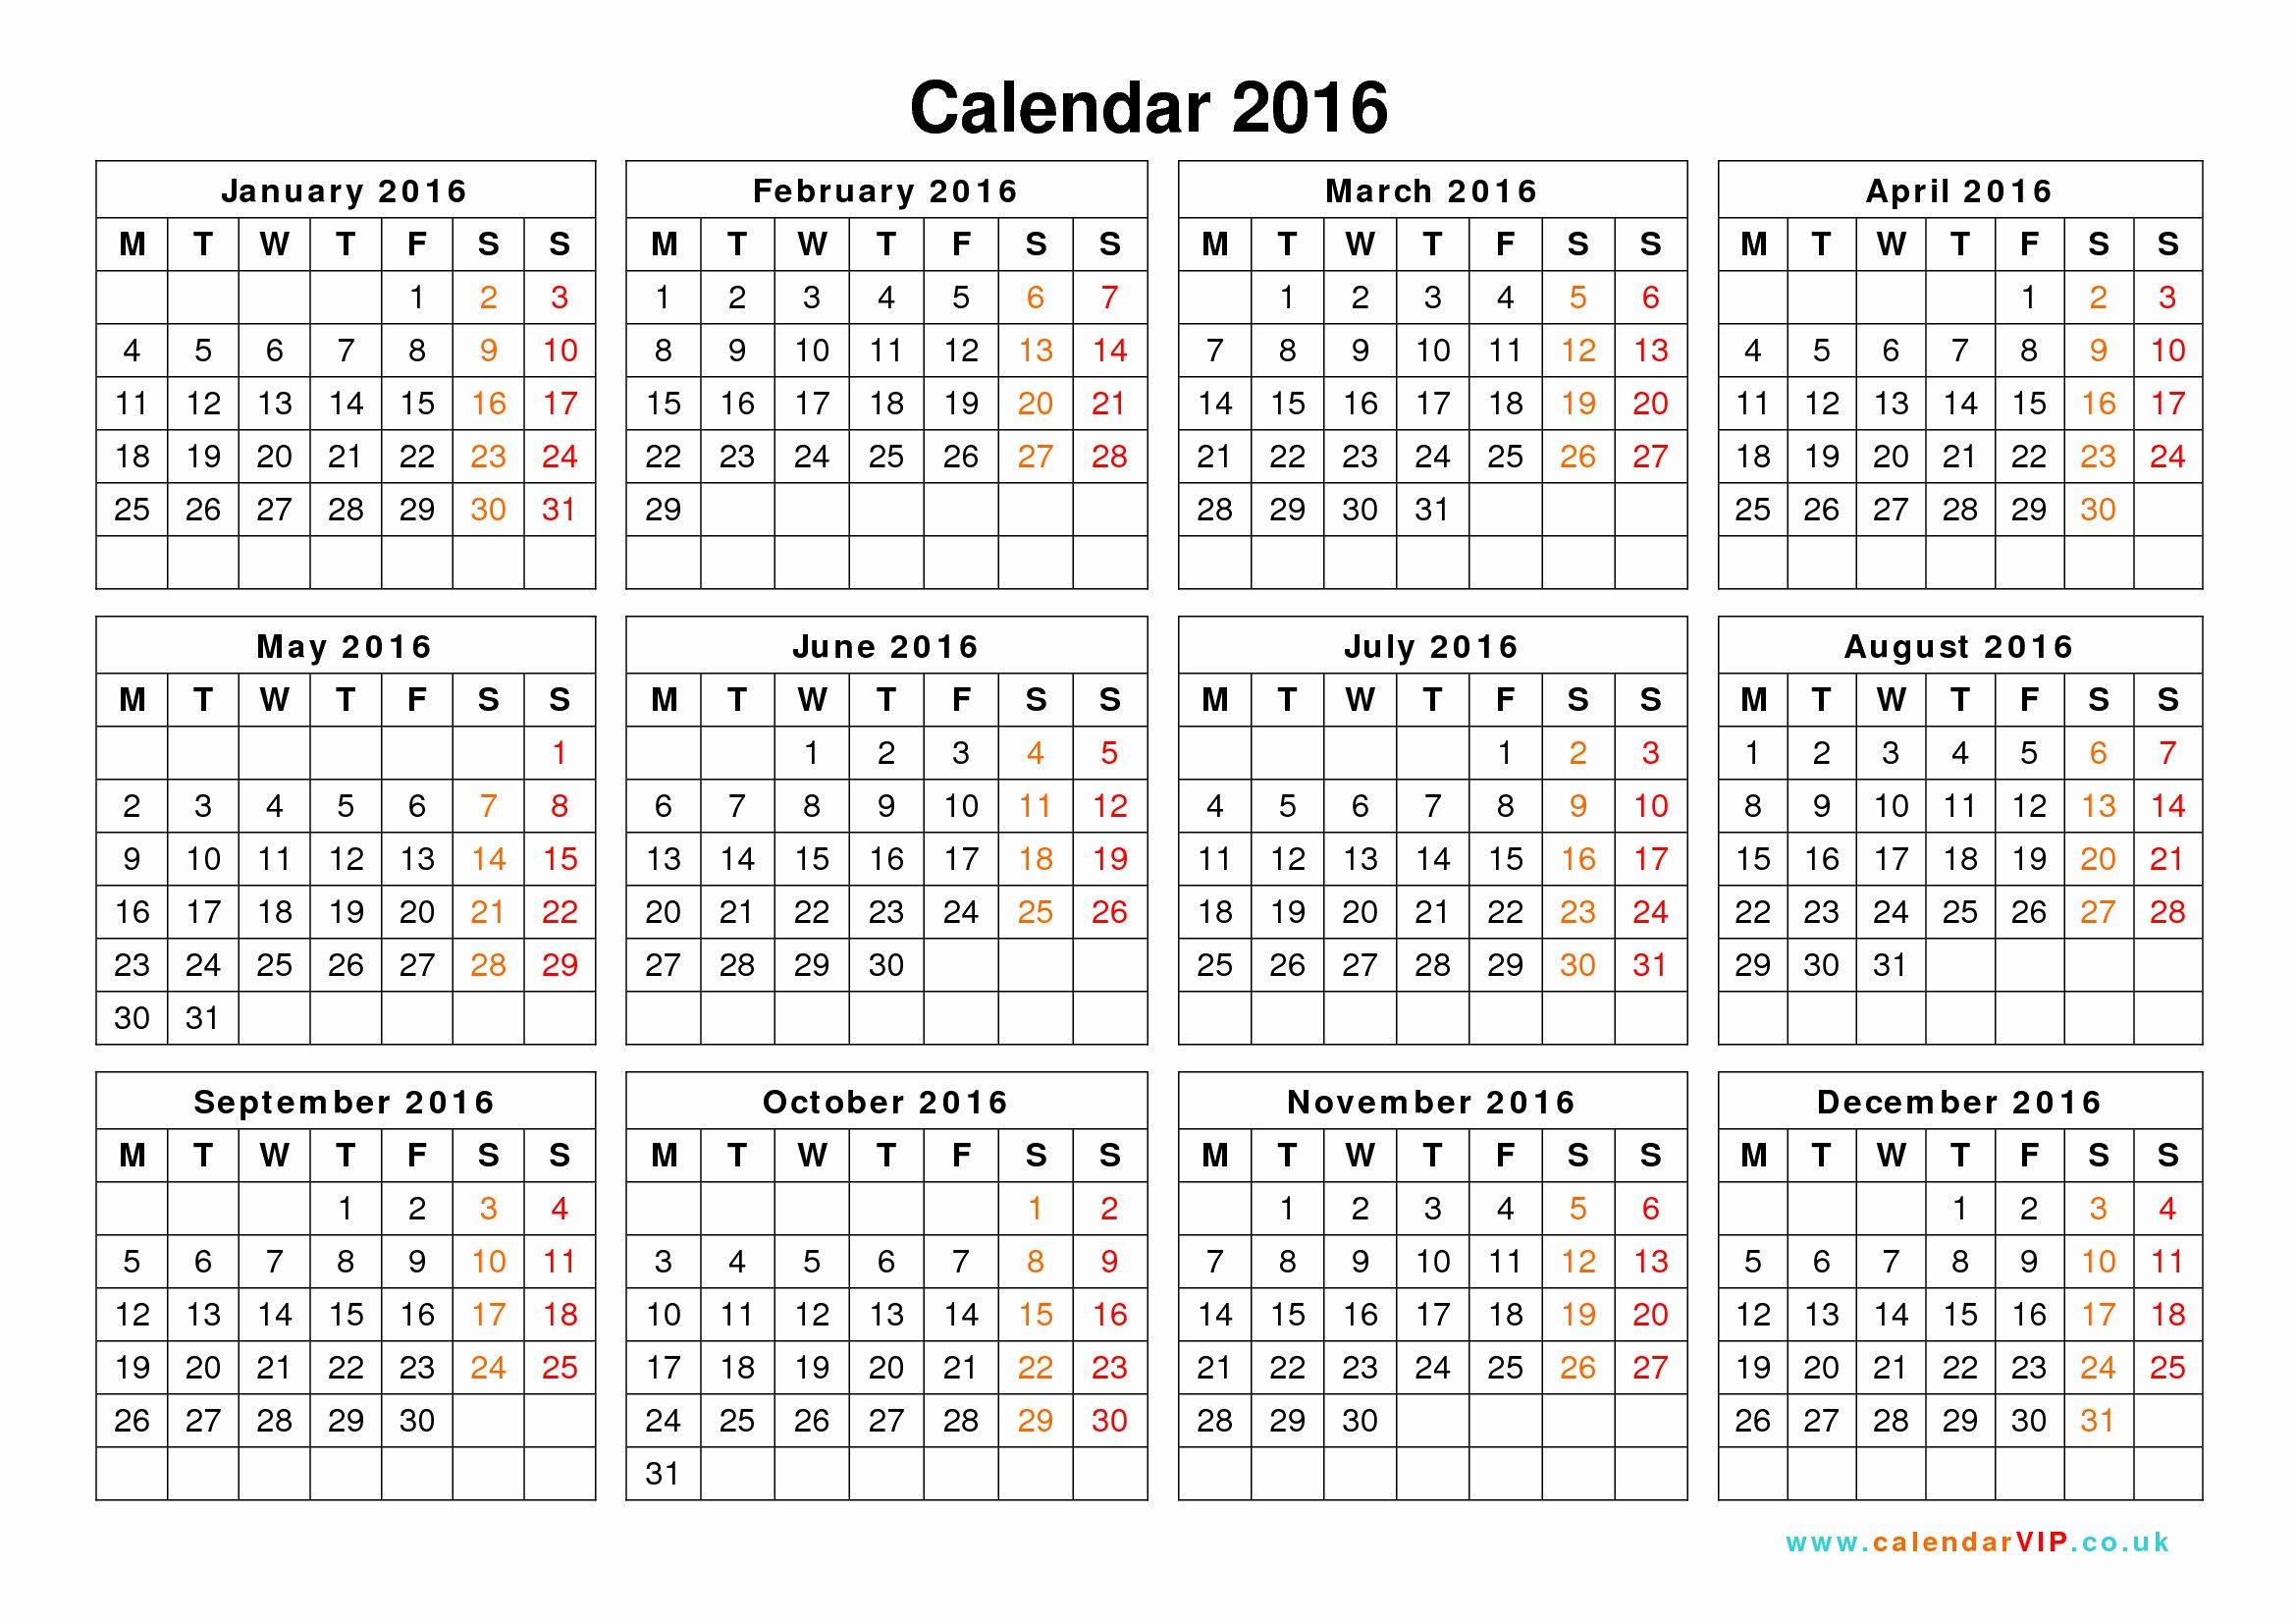 Blank Calendar Template 2016 New 2016 Calendar Templates – 2017 Printable Calendar